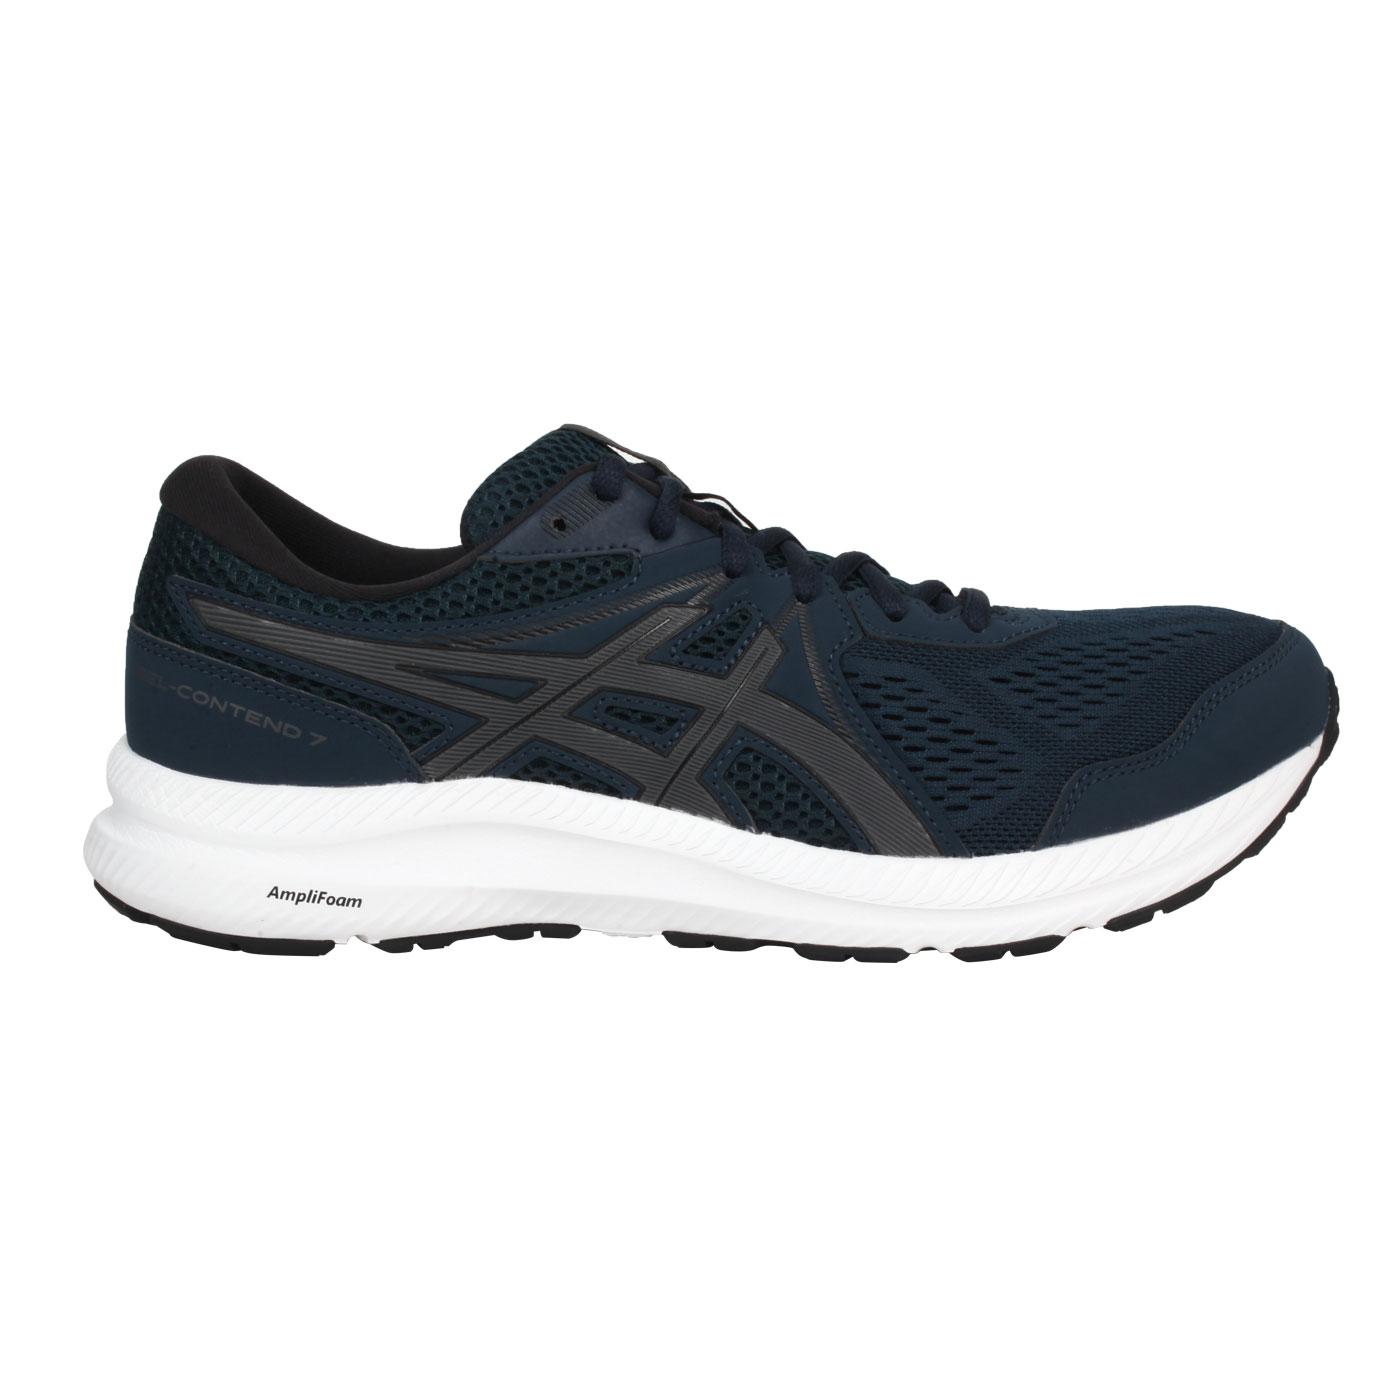 ASICS 男款慢跑鞋  @GEL-CONTEND 7@1011B040-400